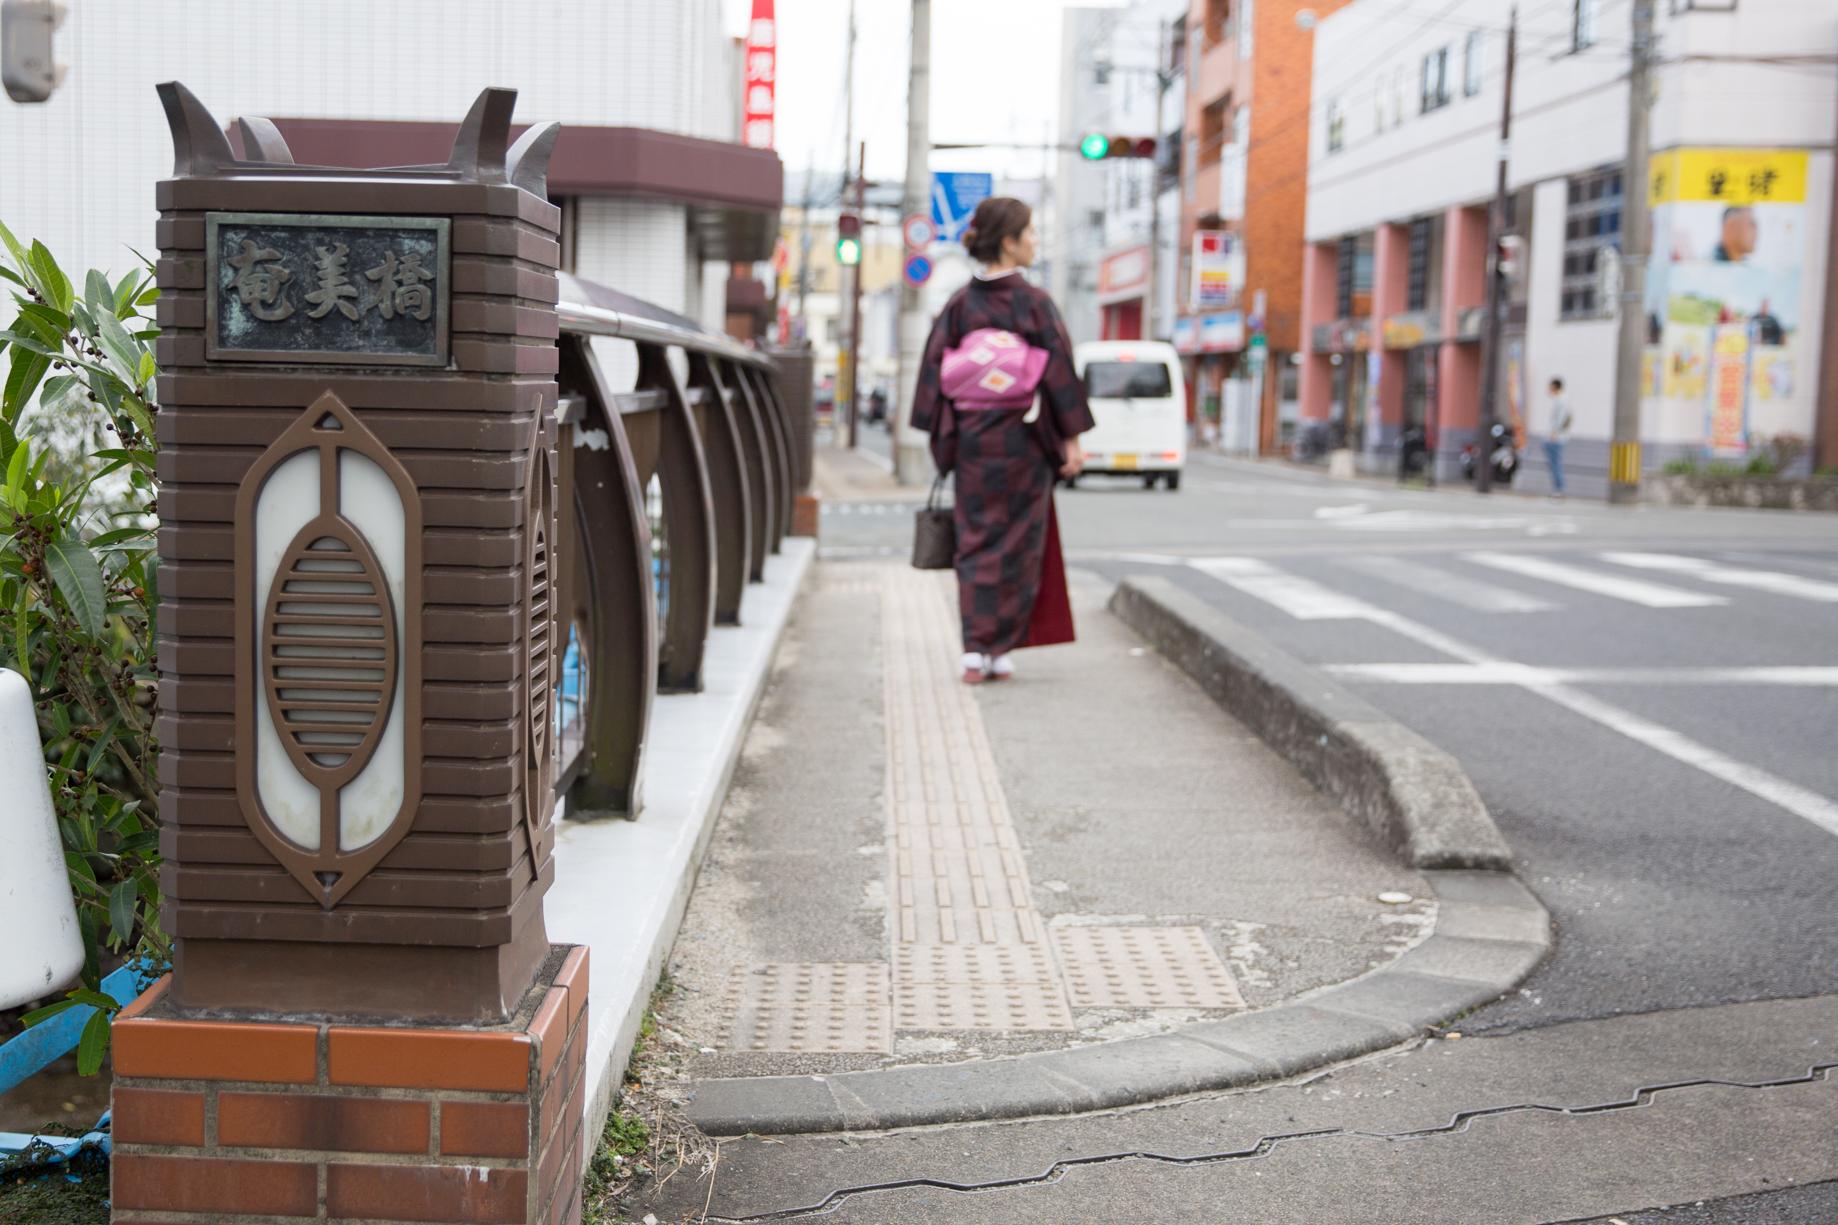 奄美市鹿児島銀行大島支店前にある奄美橋